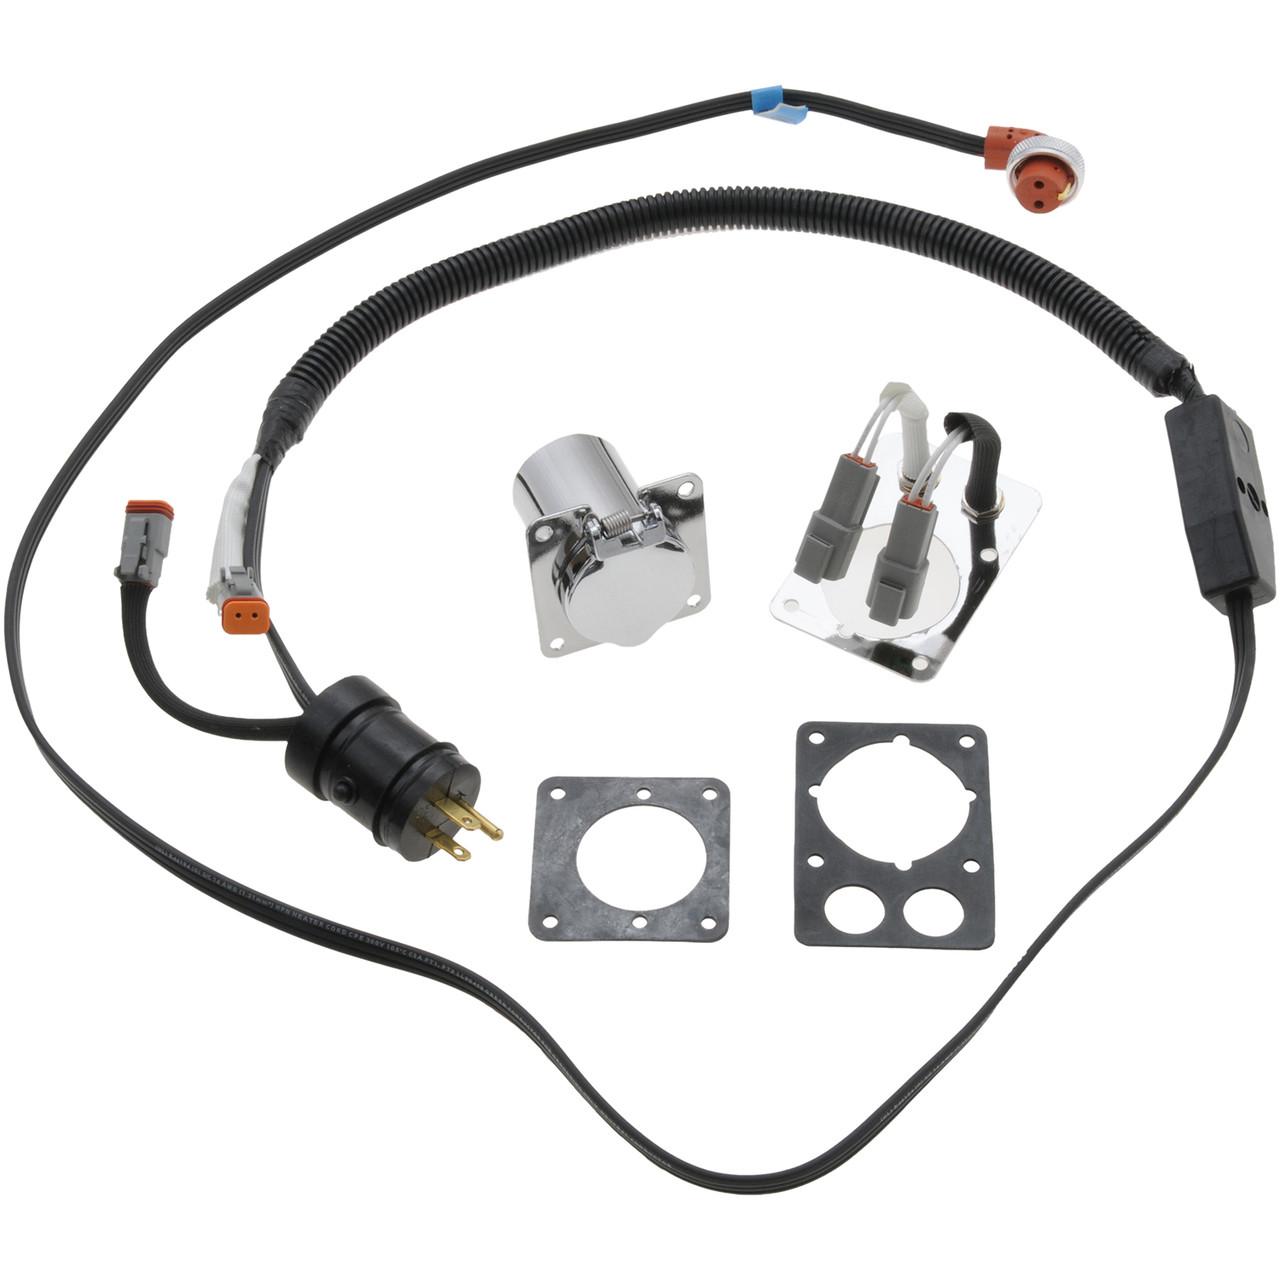 8606005 ZeroStart Power Cord 120V 6/' Weatherproof Receptacle